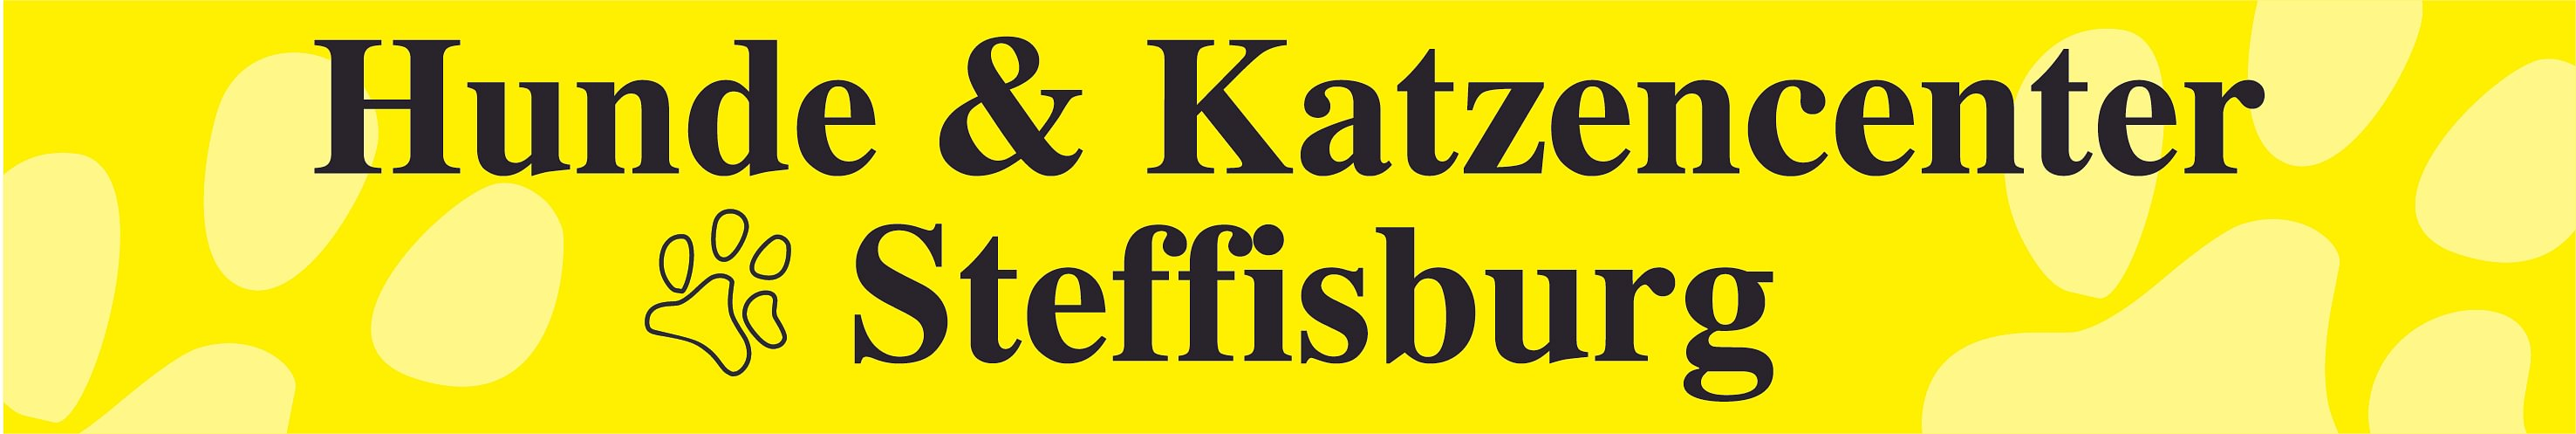 Hunde & Katzencenter GmbH